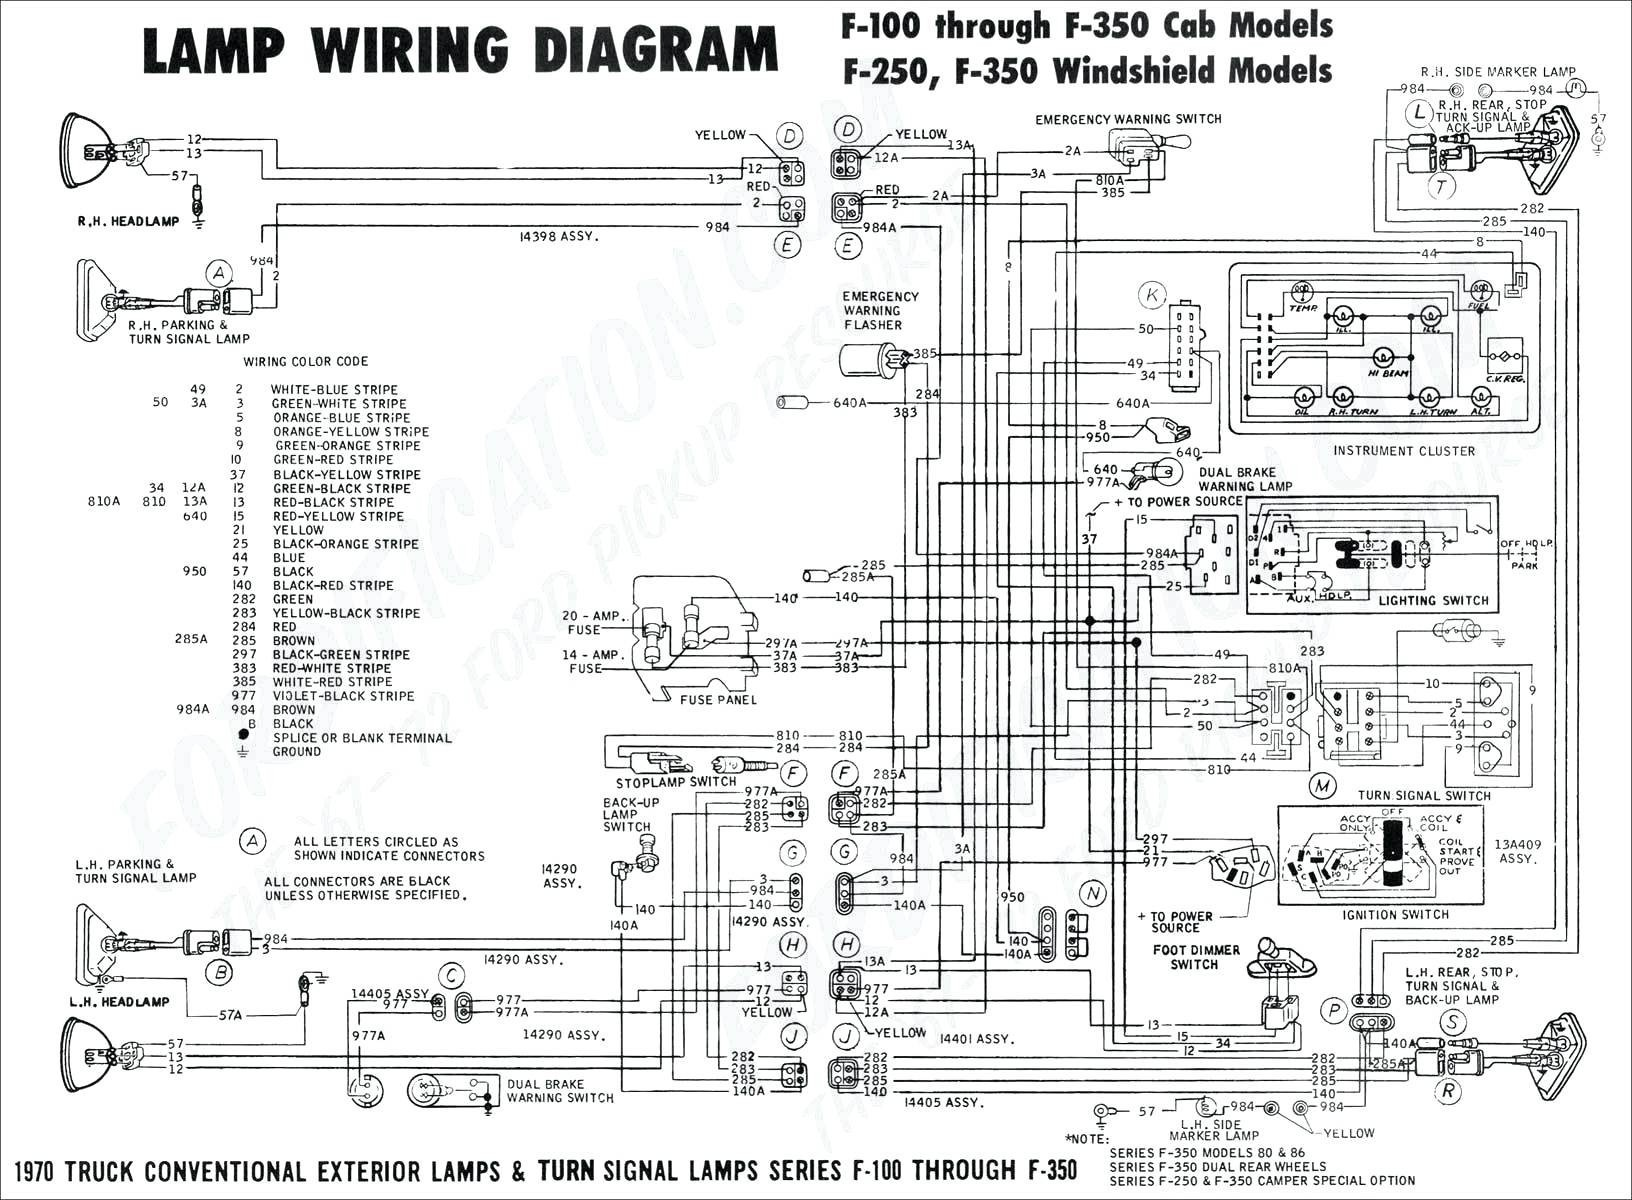 2001 ford f350 wiring diagrams wiring diagram 2001 ford f250 trailer wiring diagram